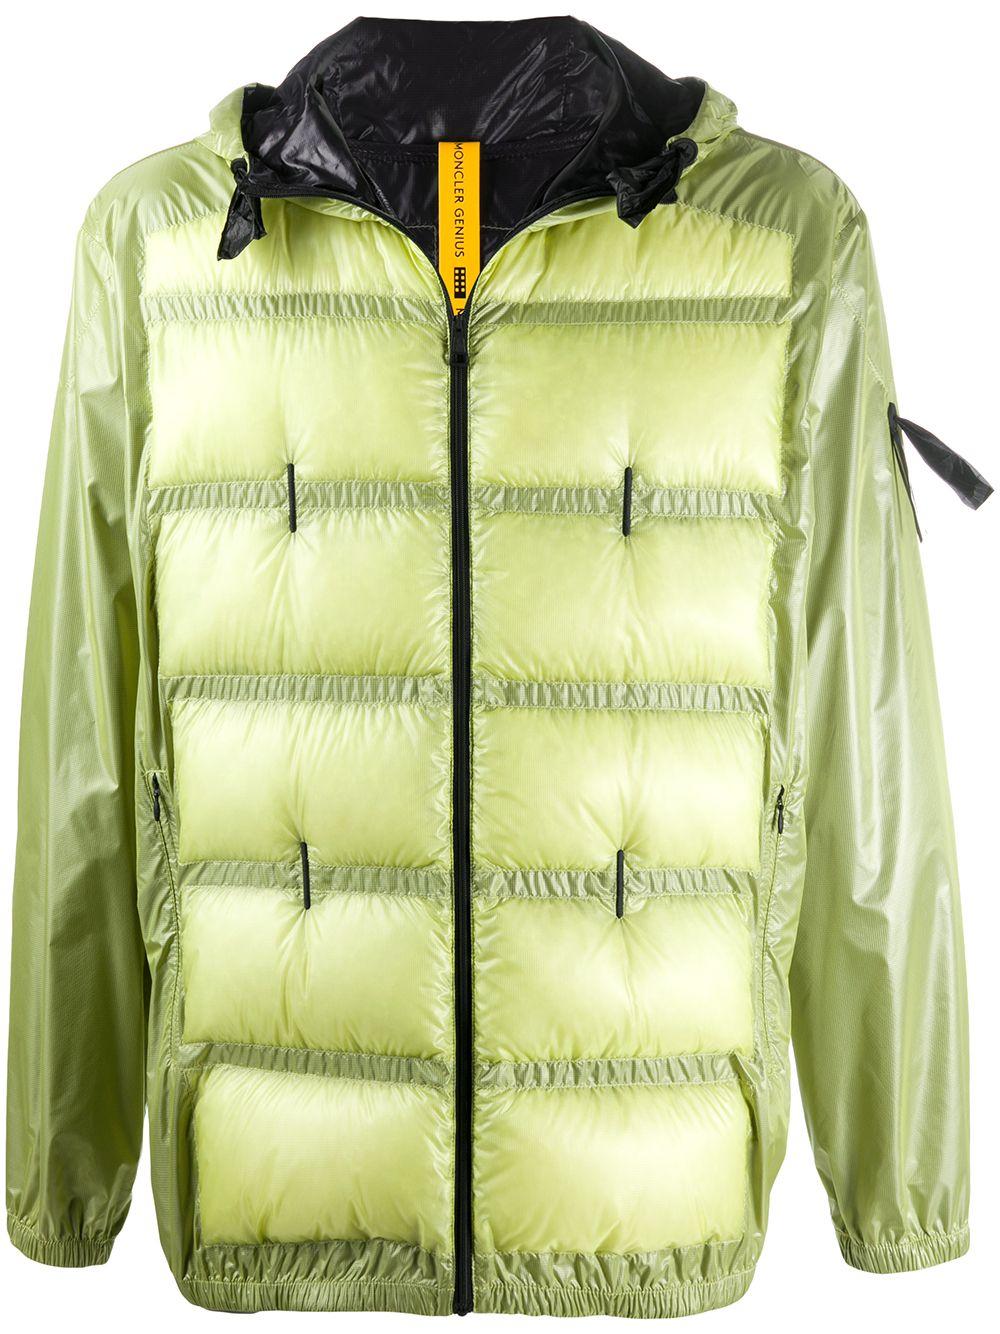 piumino Hiles Moncler Genius x Craig Green giallo Chartreuse con design trapuntato e imbottito MONCLER GENIUS | Piumini | HILES 1A502-10-C0624112